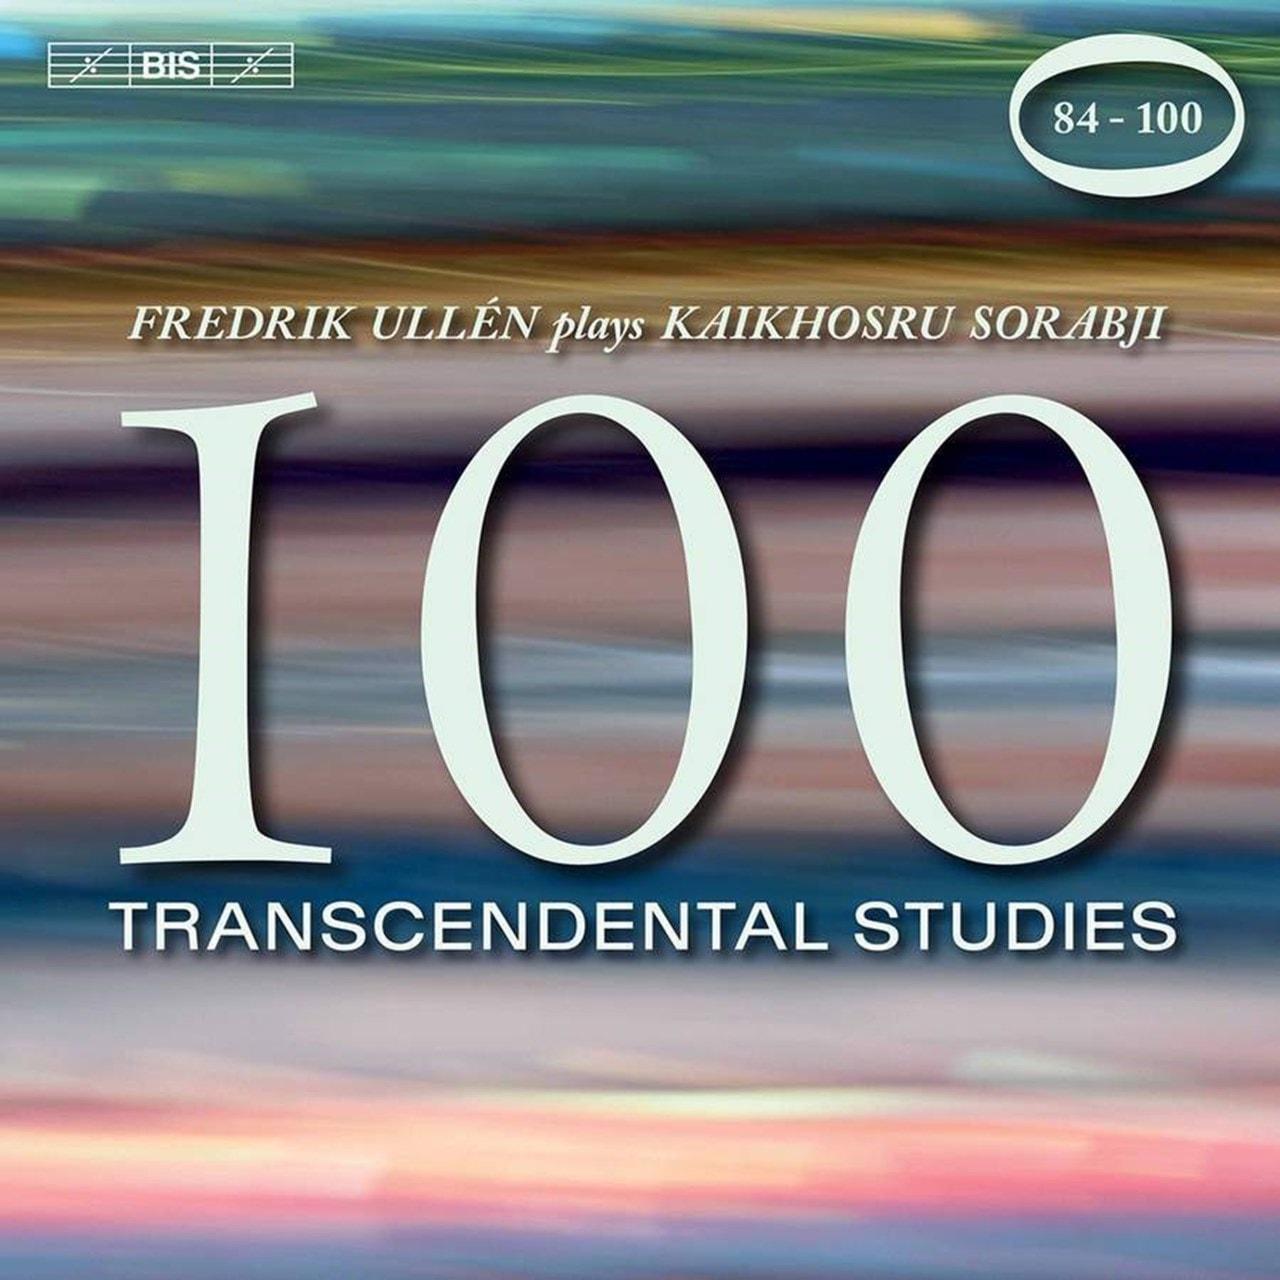 Fredrik Ullen Plays Kaikhosru Sorabji: 100 Transcendental Studies: 84-100 - 1